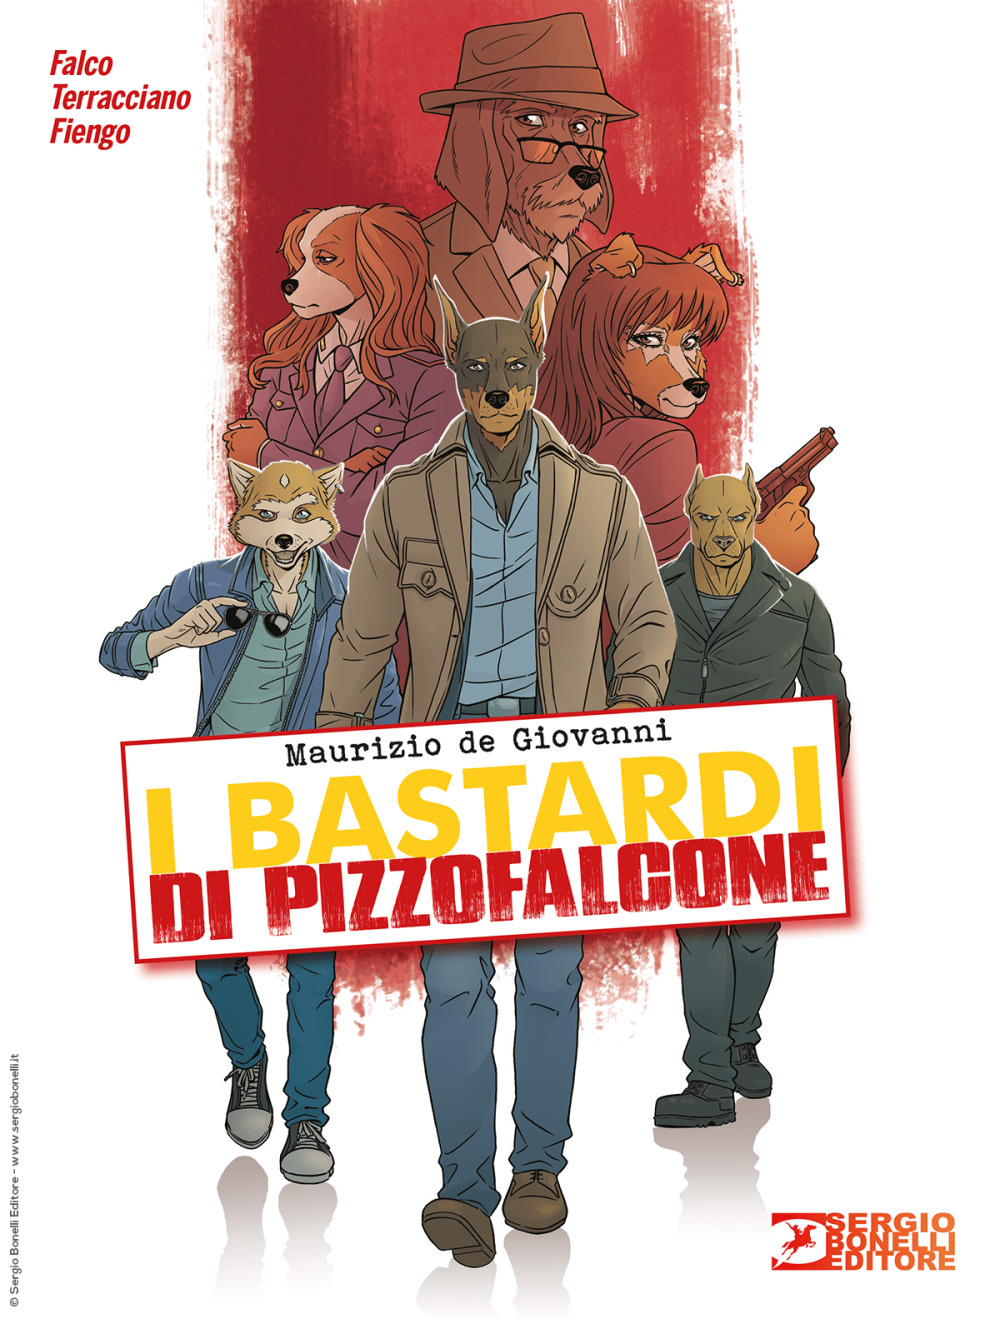 I BASTARDI DI PIZZOFALCONE 1559745388325.png--i_bastardi_di_pizzofalcone_cover